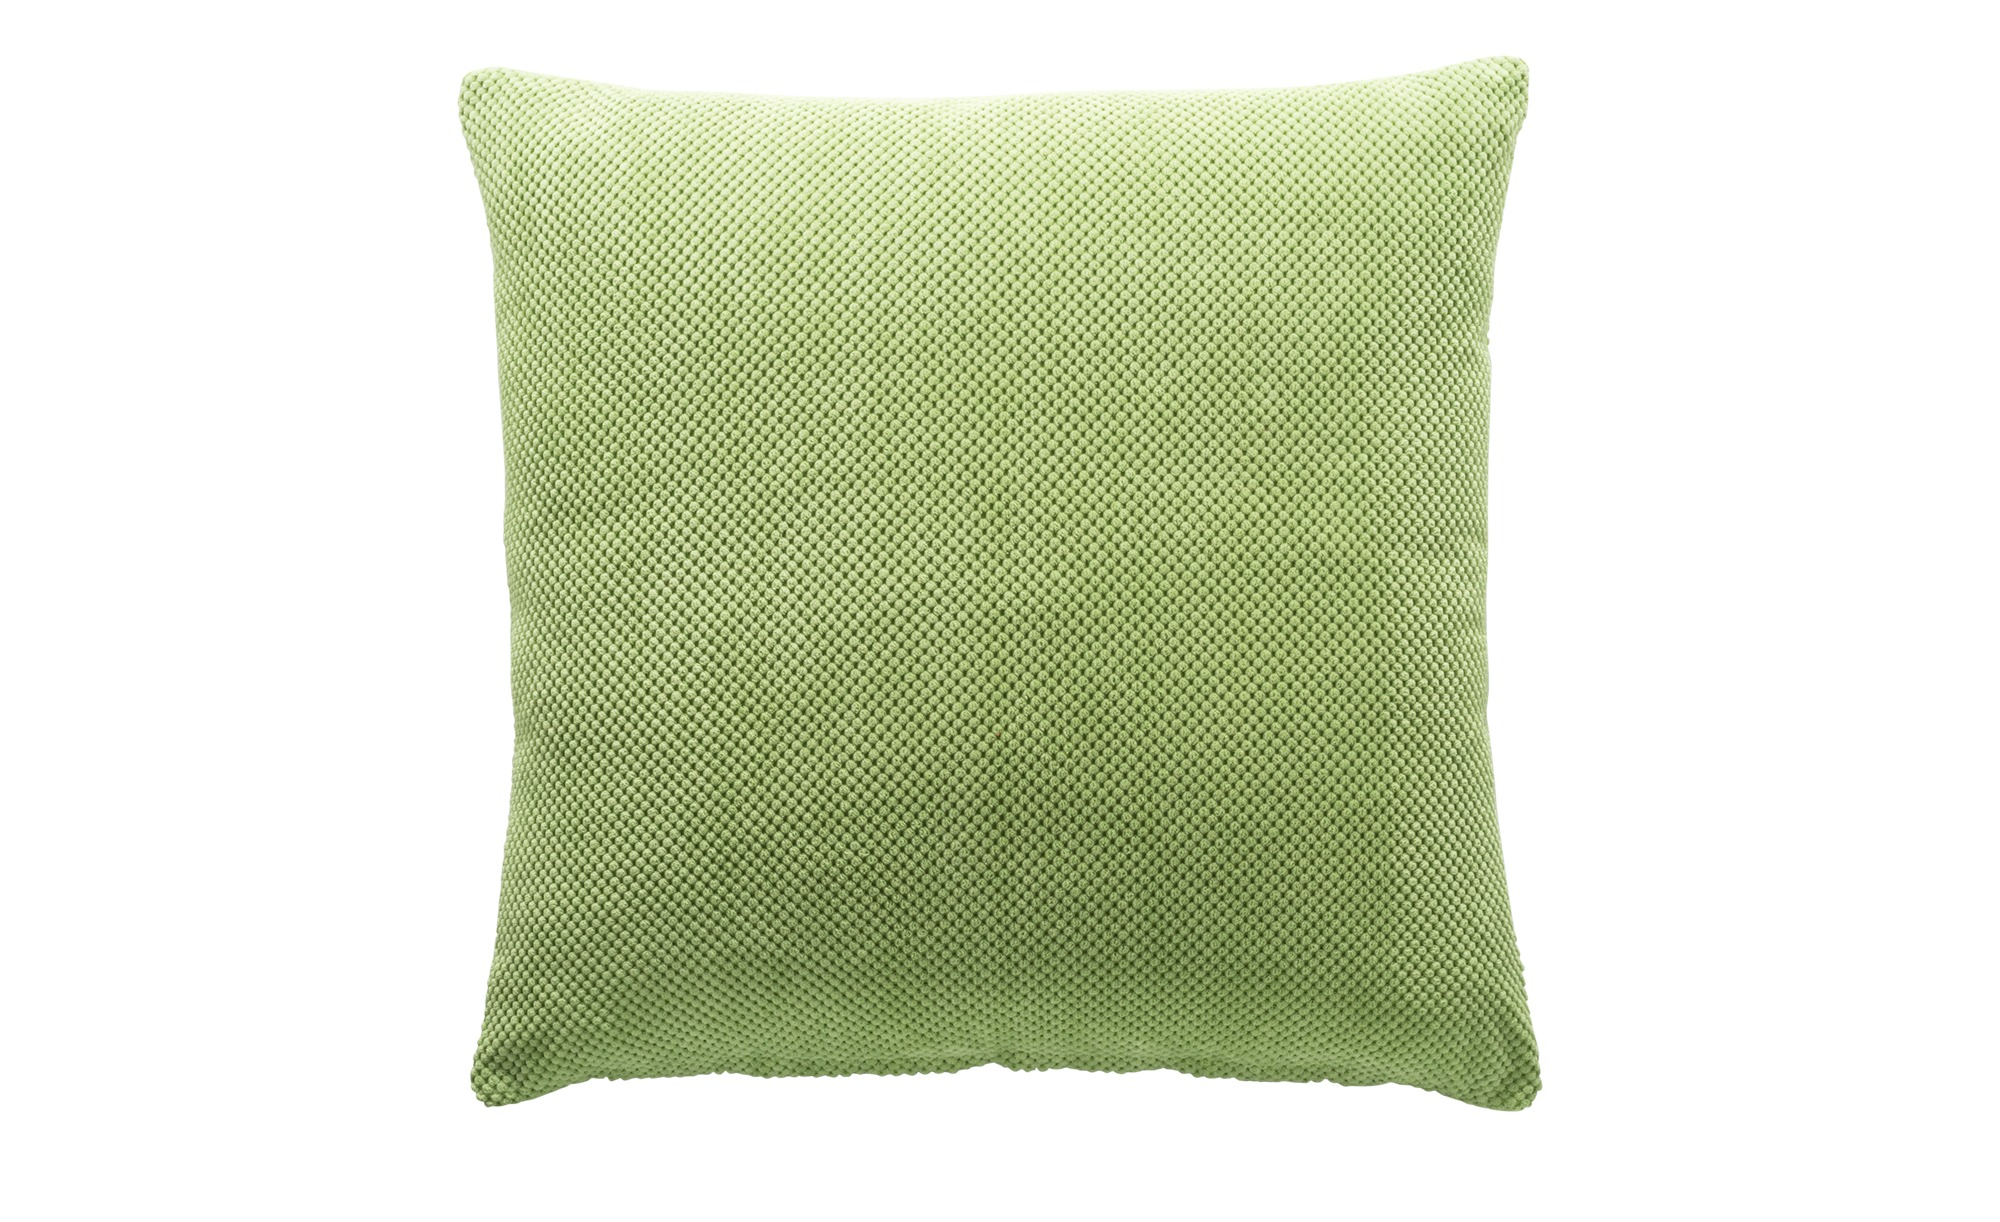 HOME STORY Bodenkissen  Lisa ¦ grün ¦ Polyester ¦ Maße (cm): B: 70 Heimtextilien > Kissen > Bodenkissen - Höffner